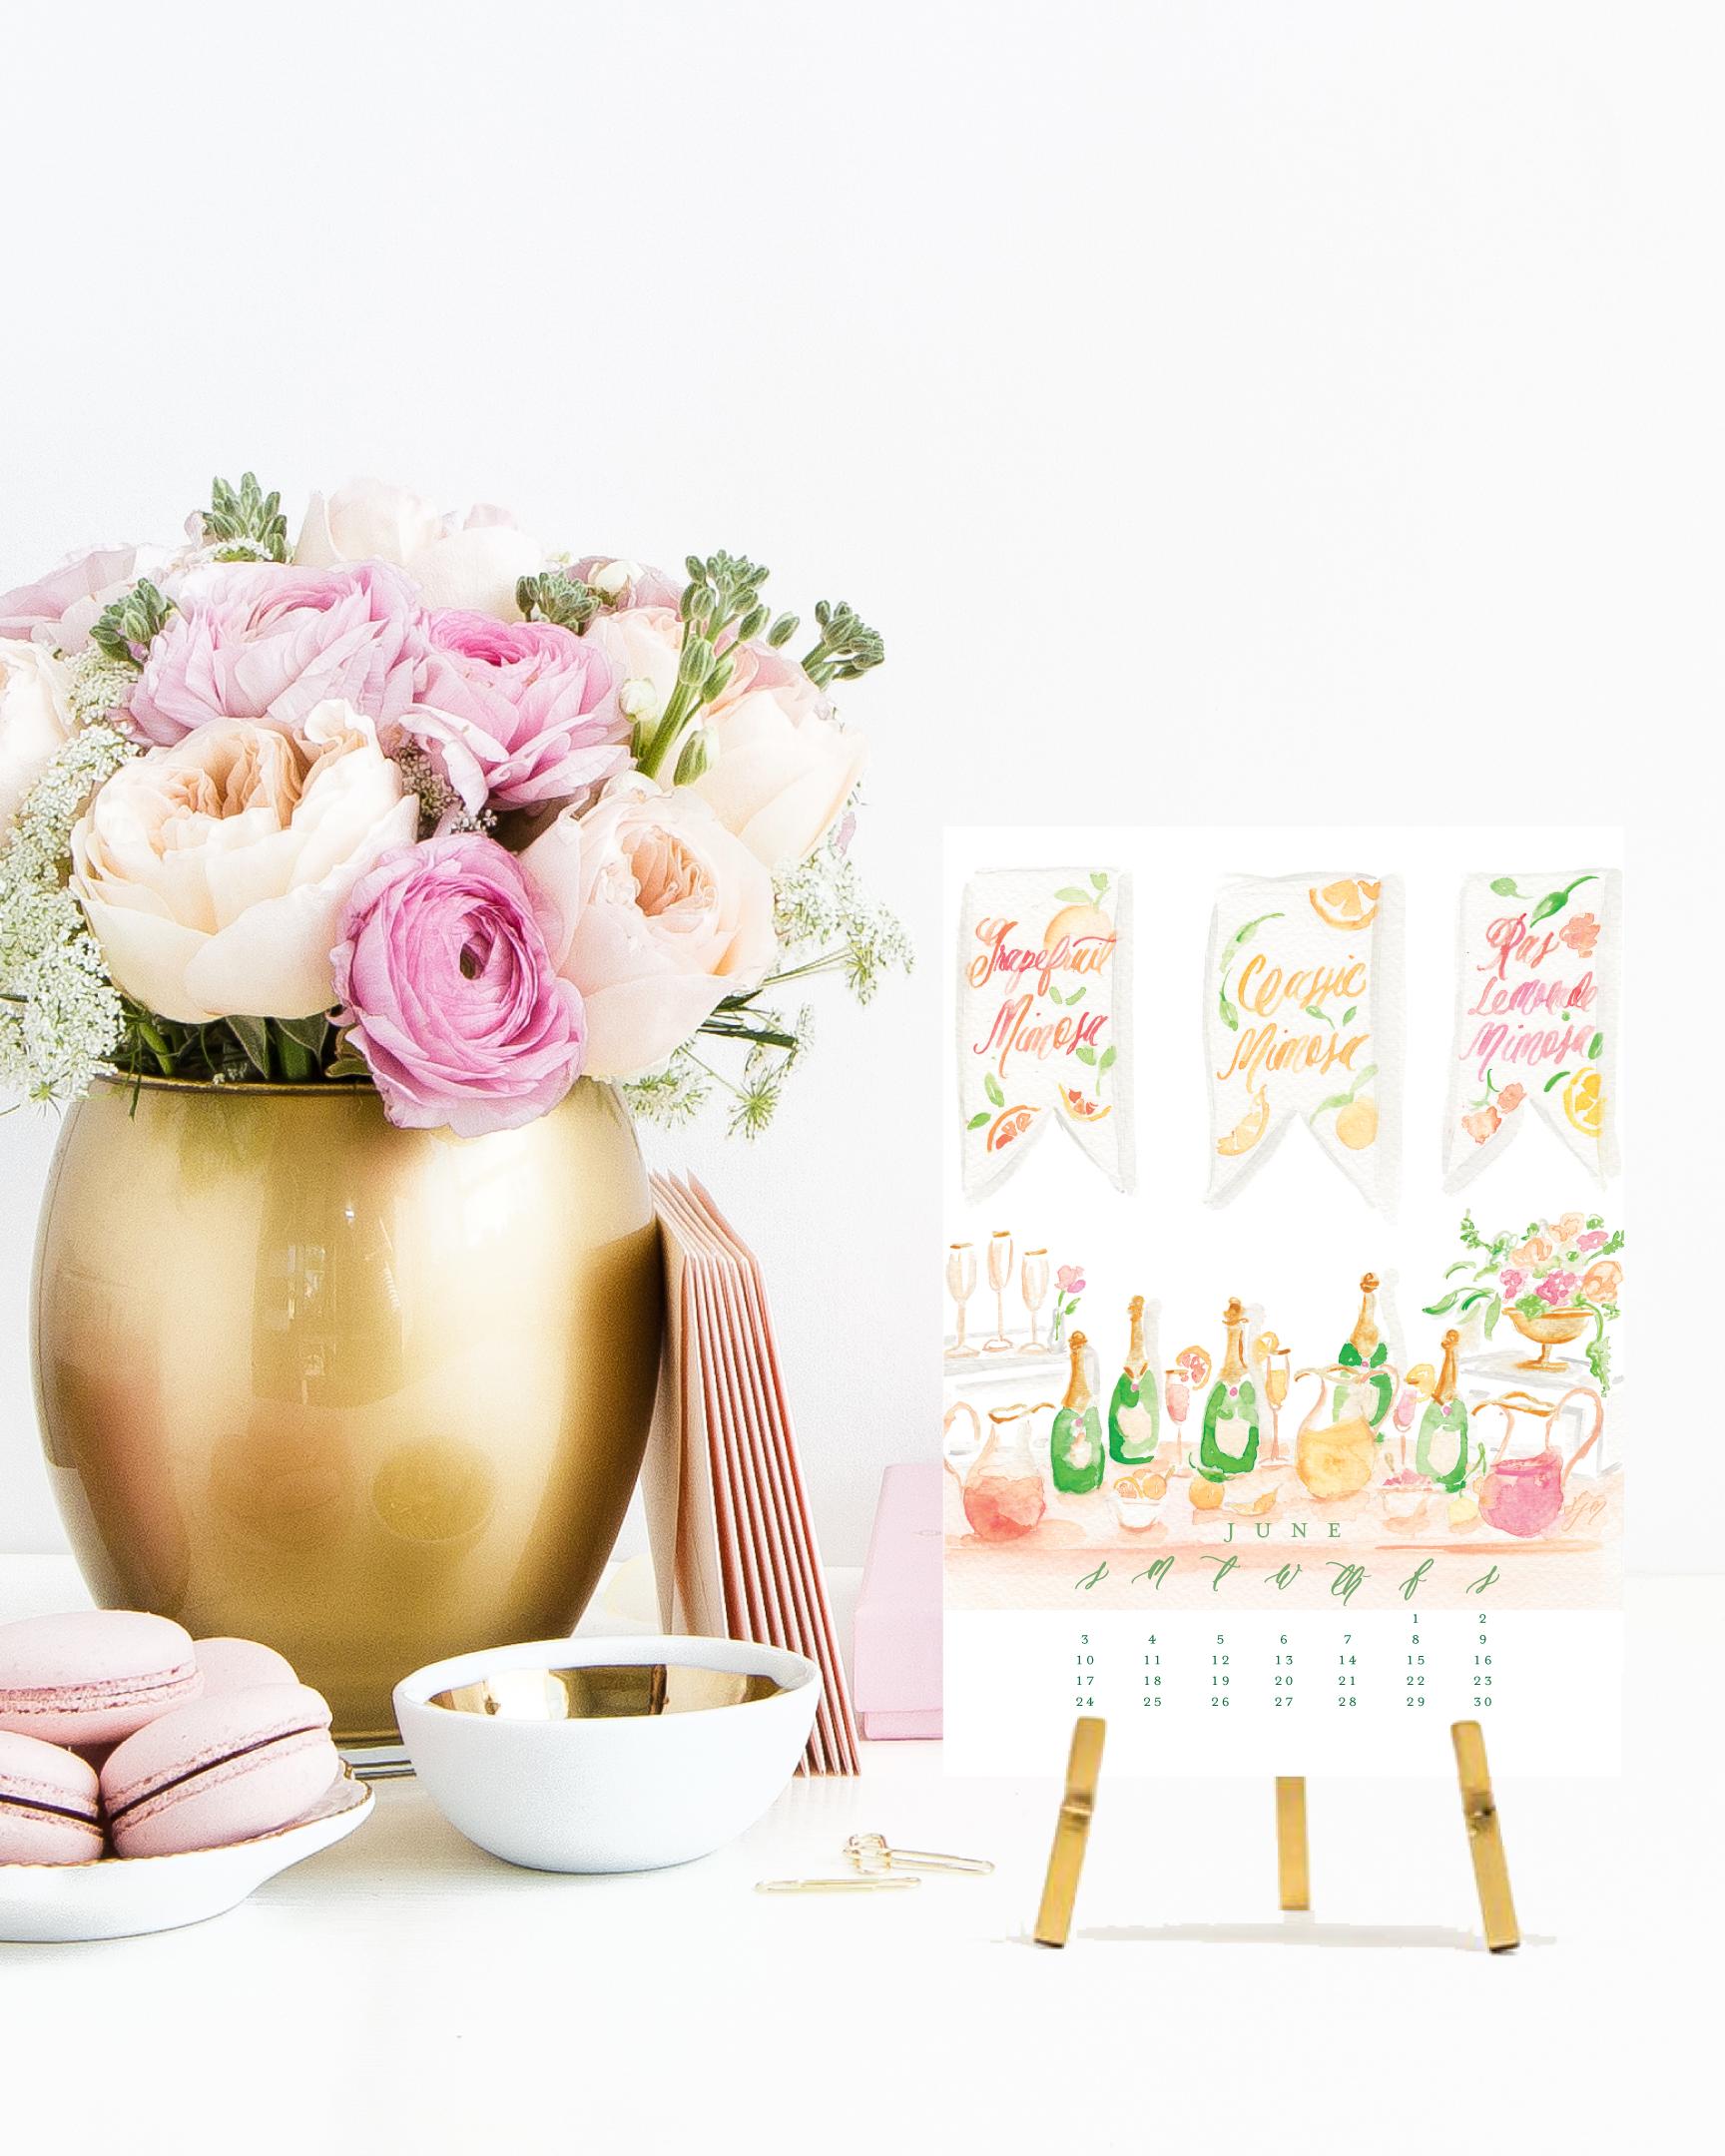 Simply Jessica Marie 2018 Cocktail Calendar | Brunch Cocktails | Cocktail Watercolor Illustration Desk Calendar